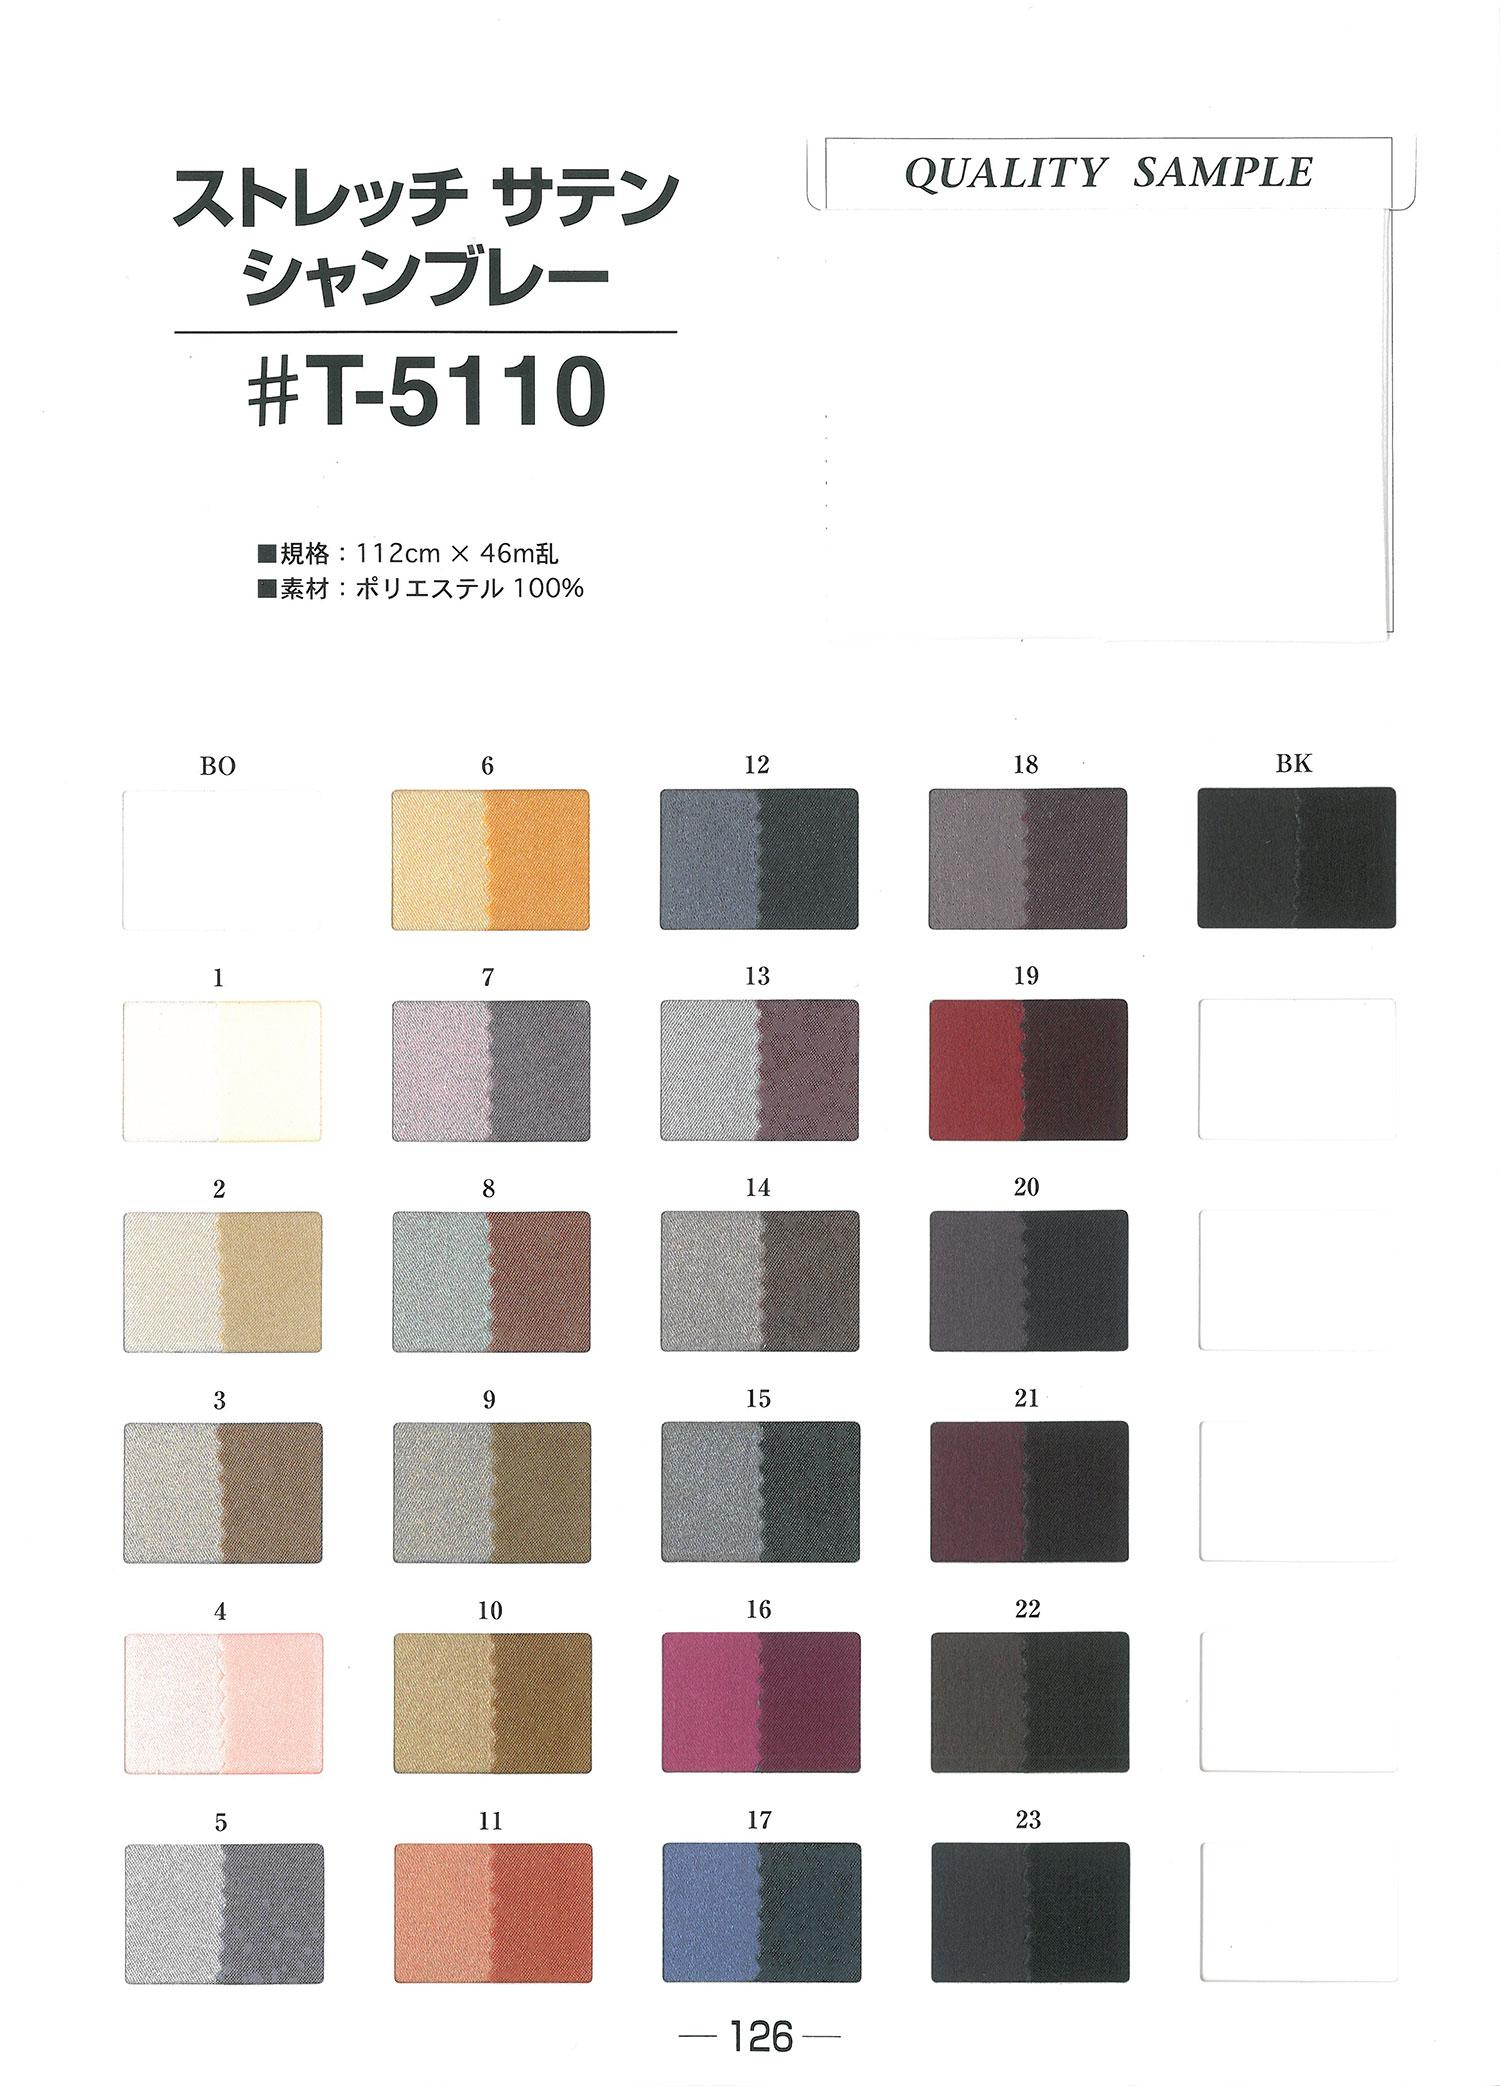 T5110 ストレッチサテンシャンブレー[裏地] 東レ/オークラ商事 - ApparelX アパレル資材卸通販